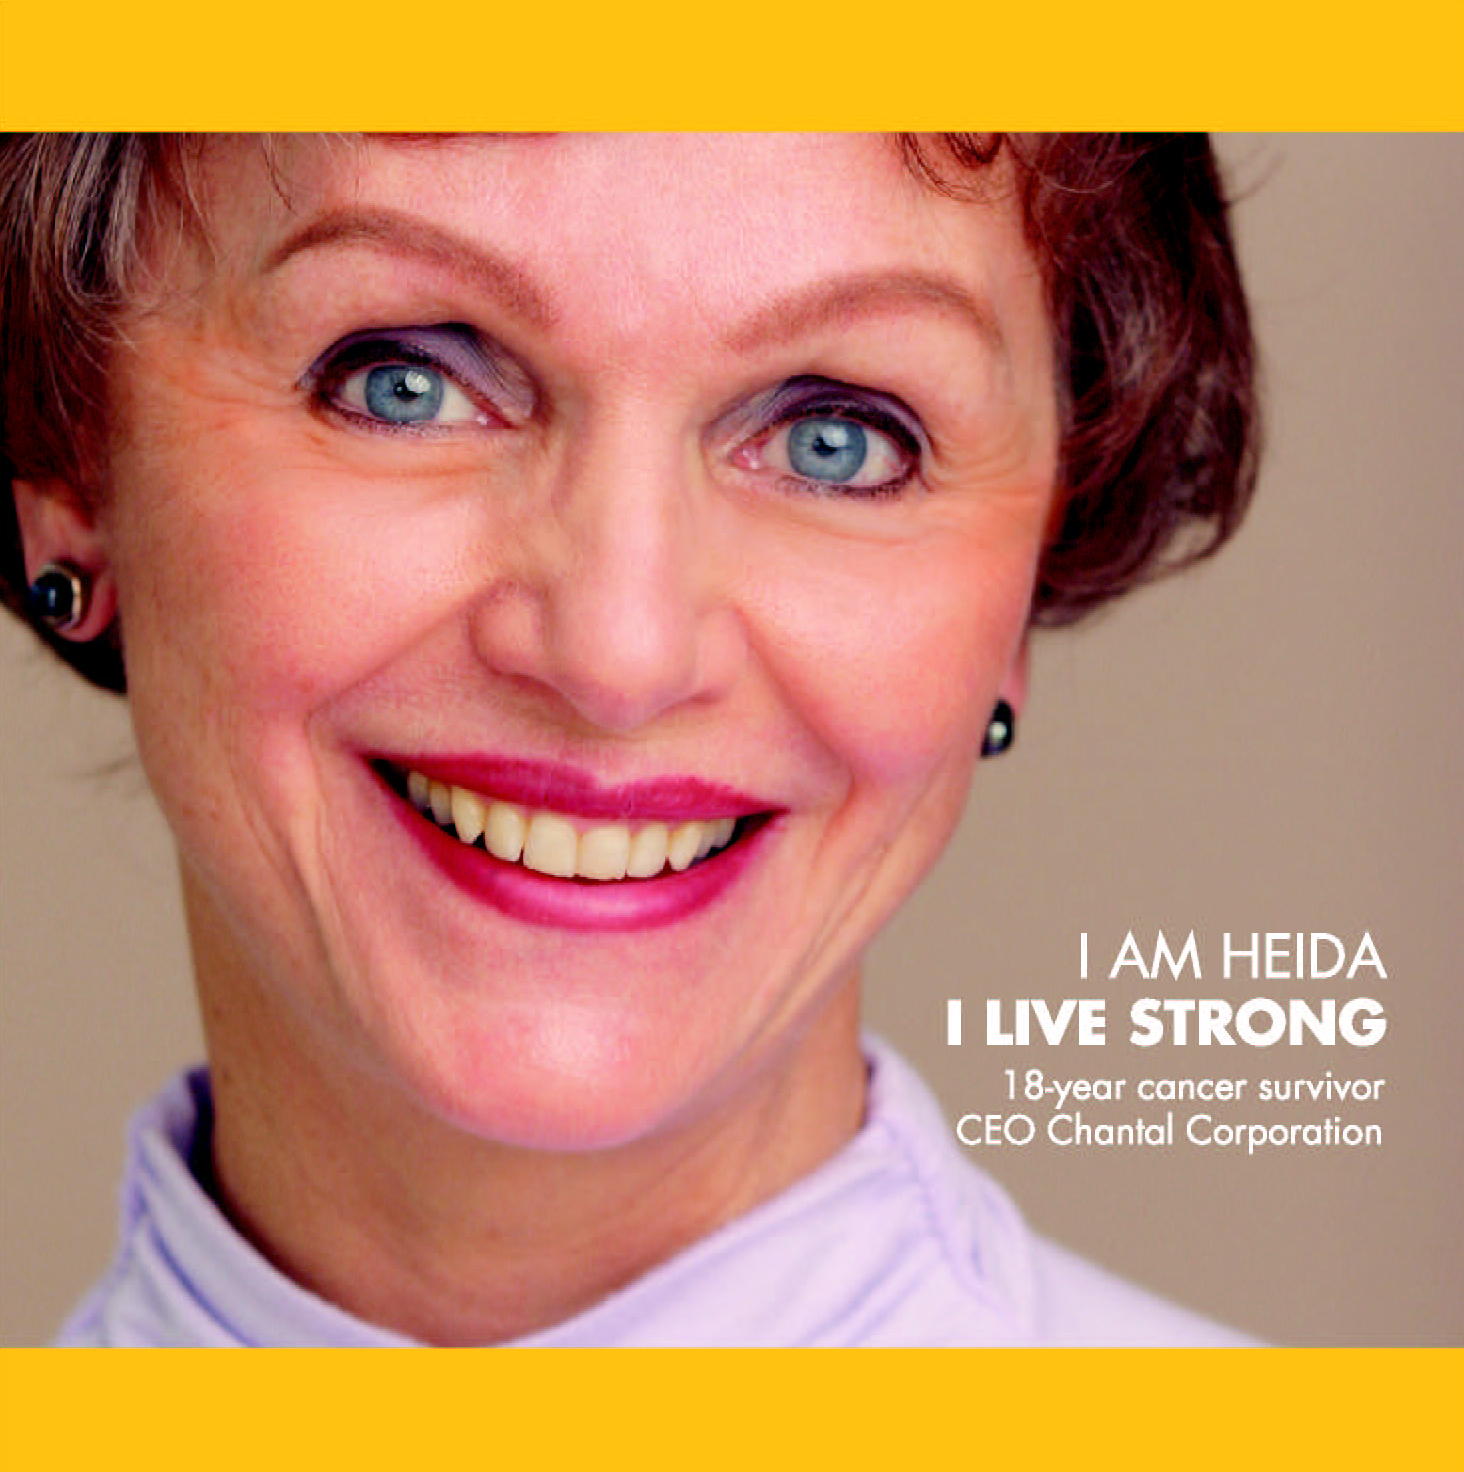 Heida in LiveStrong promo